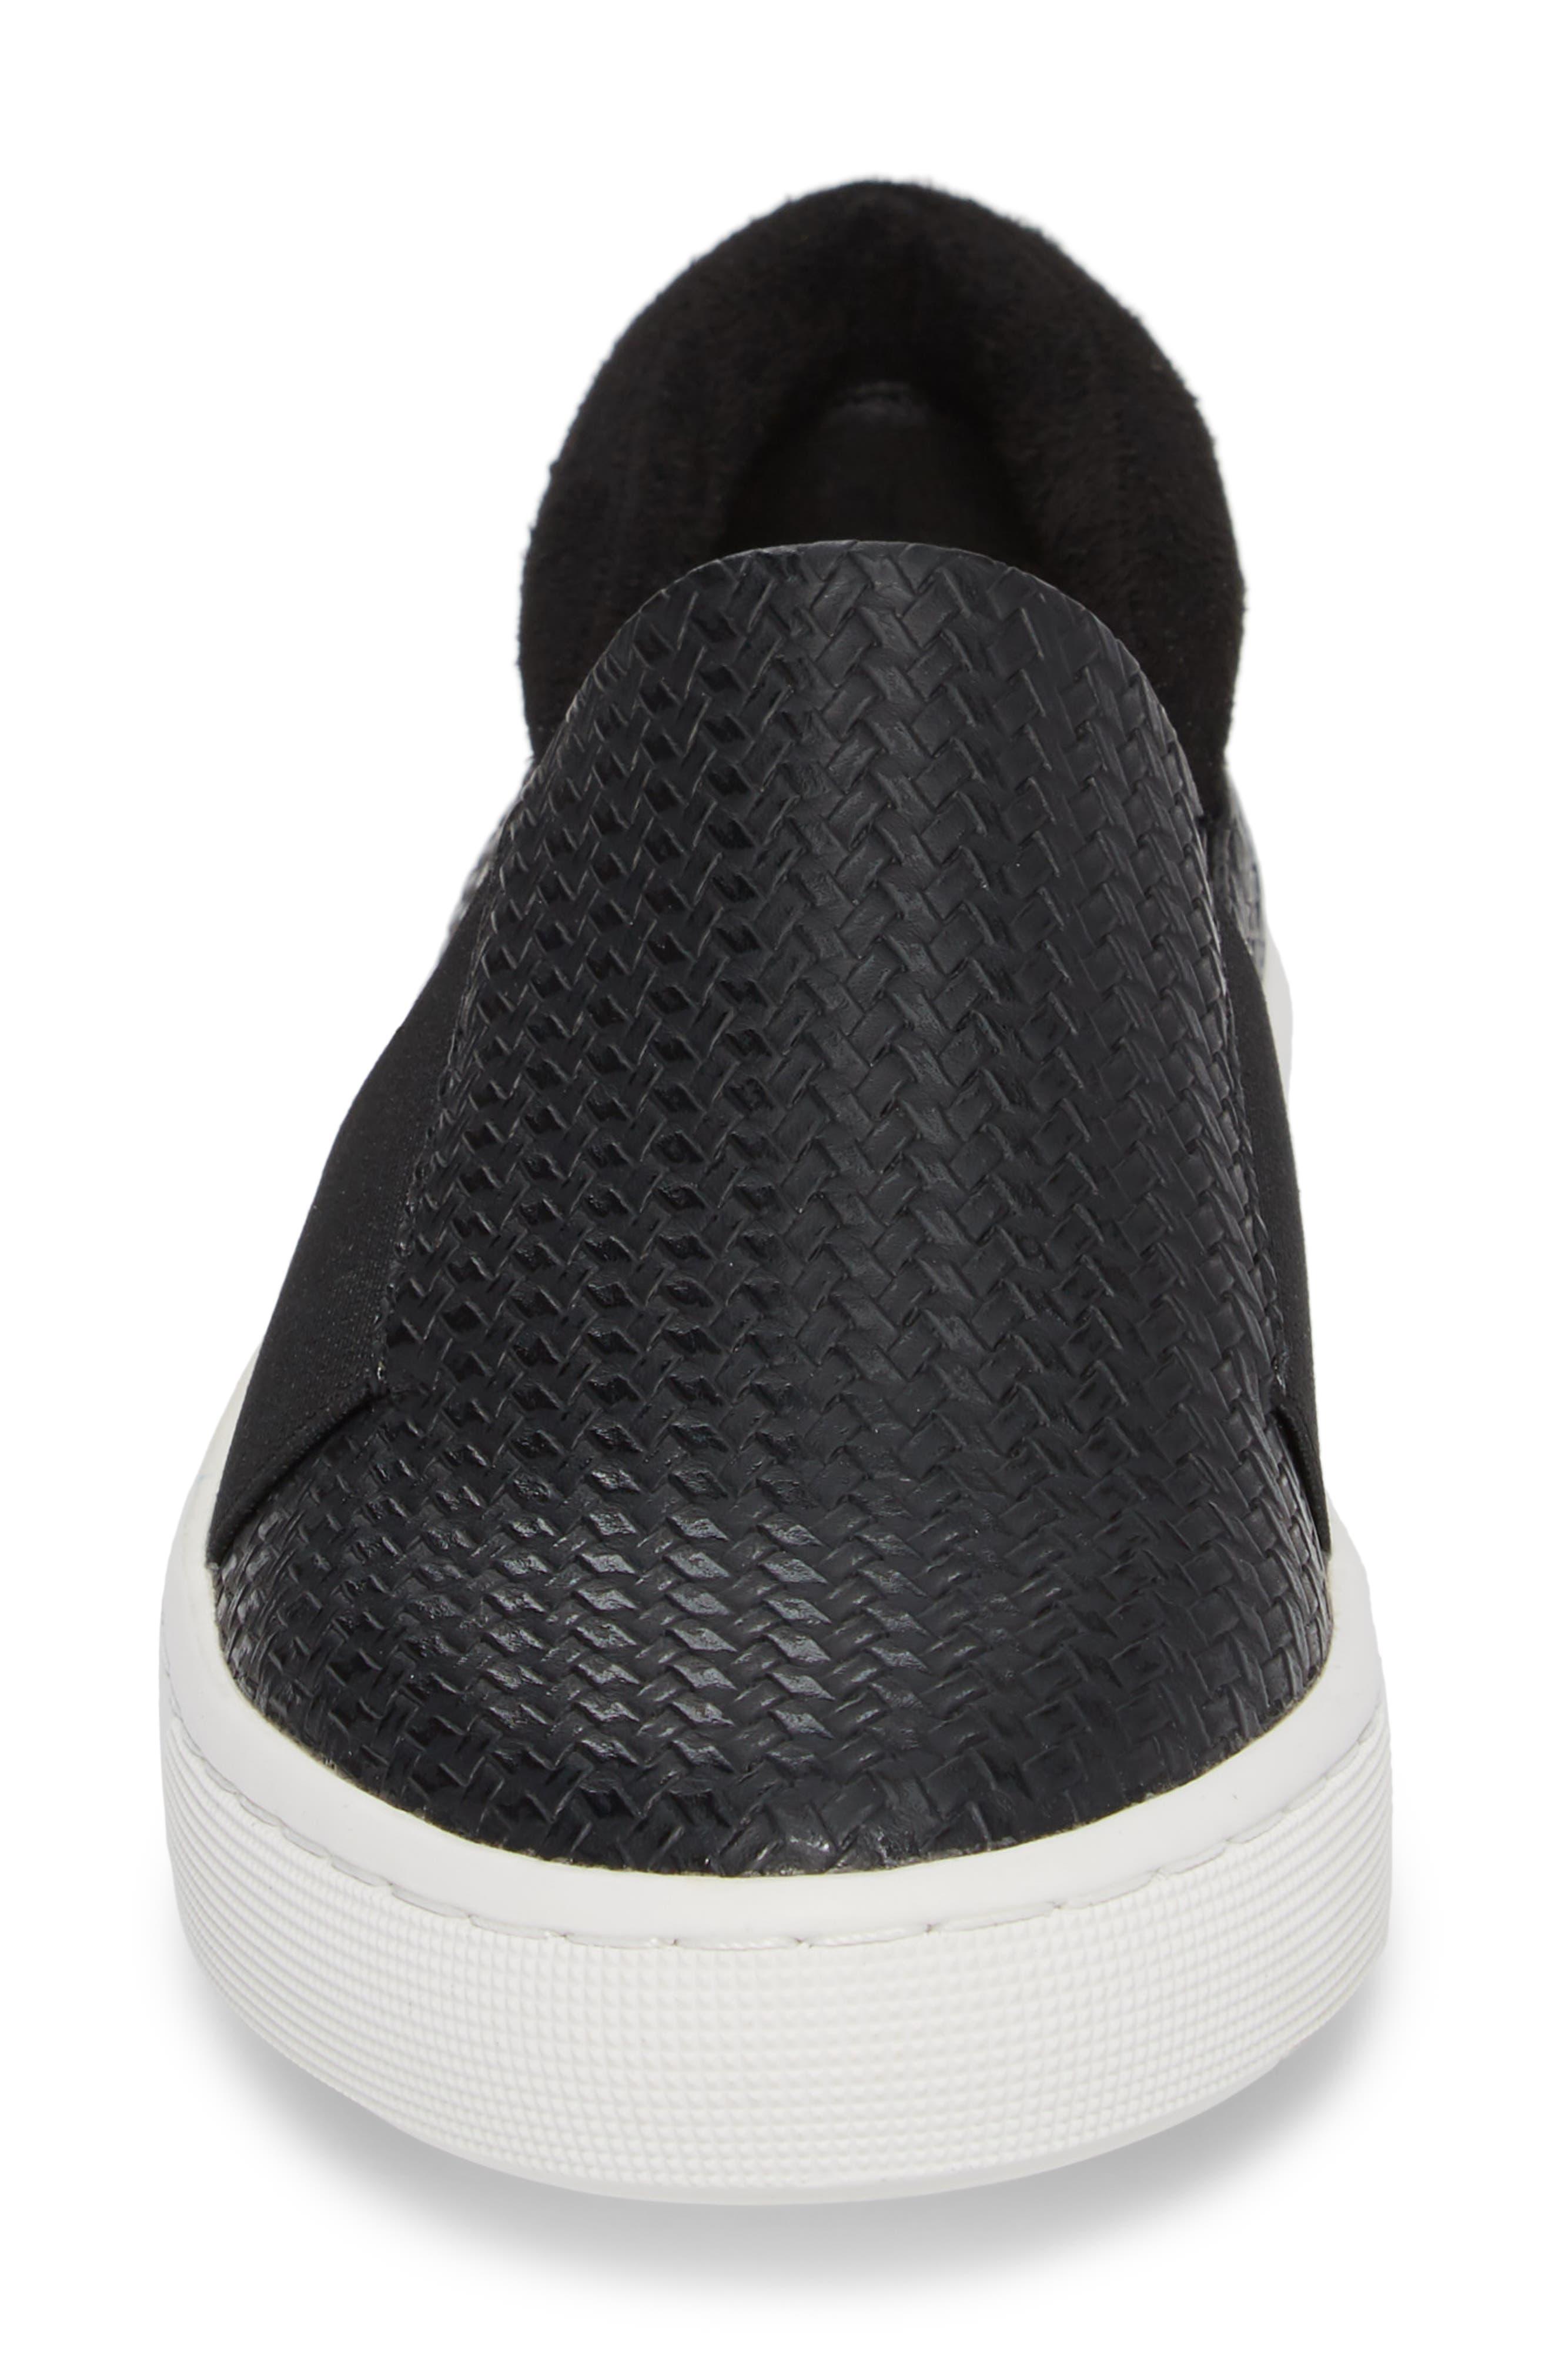 BELLA VITA, Ramp II Slip-On Sneaker, Alternate thumbnail 4, color, BLACK FABRIC